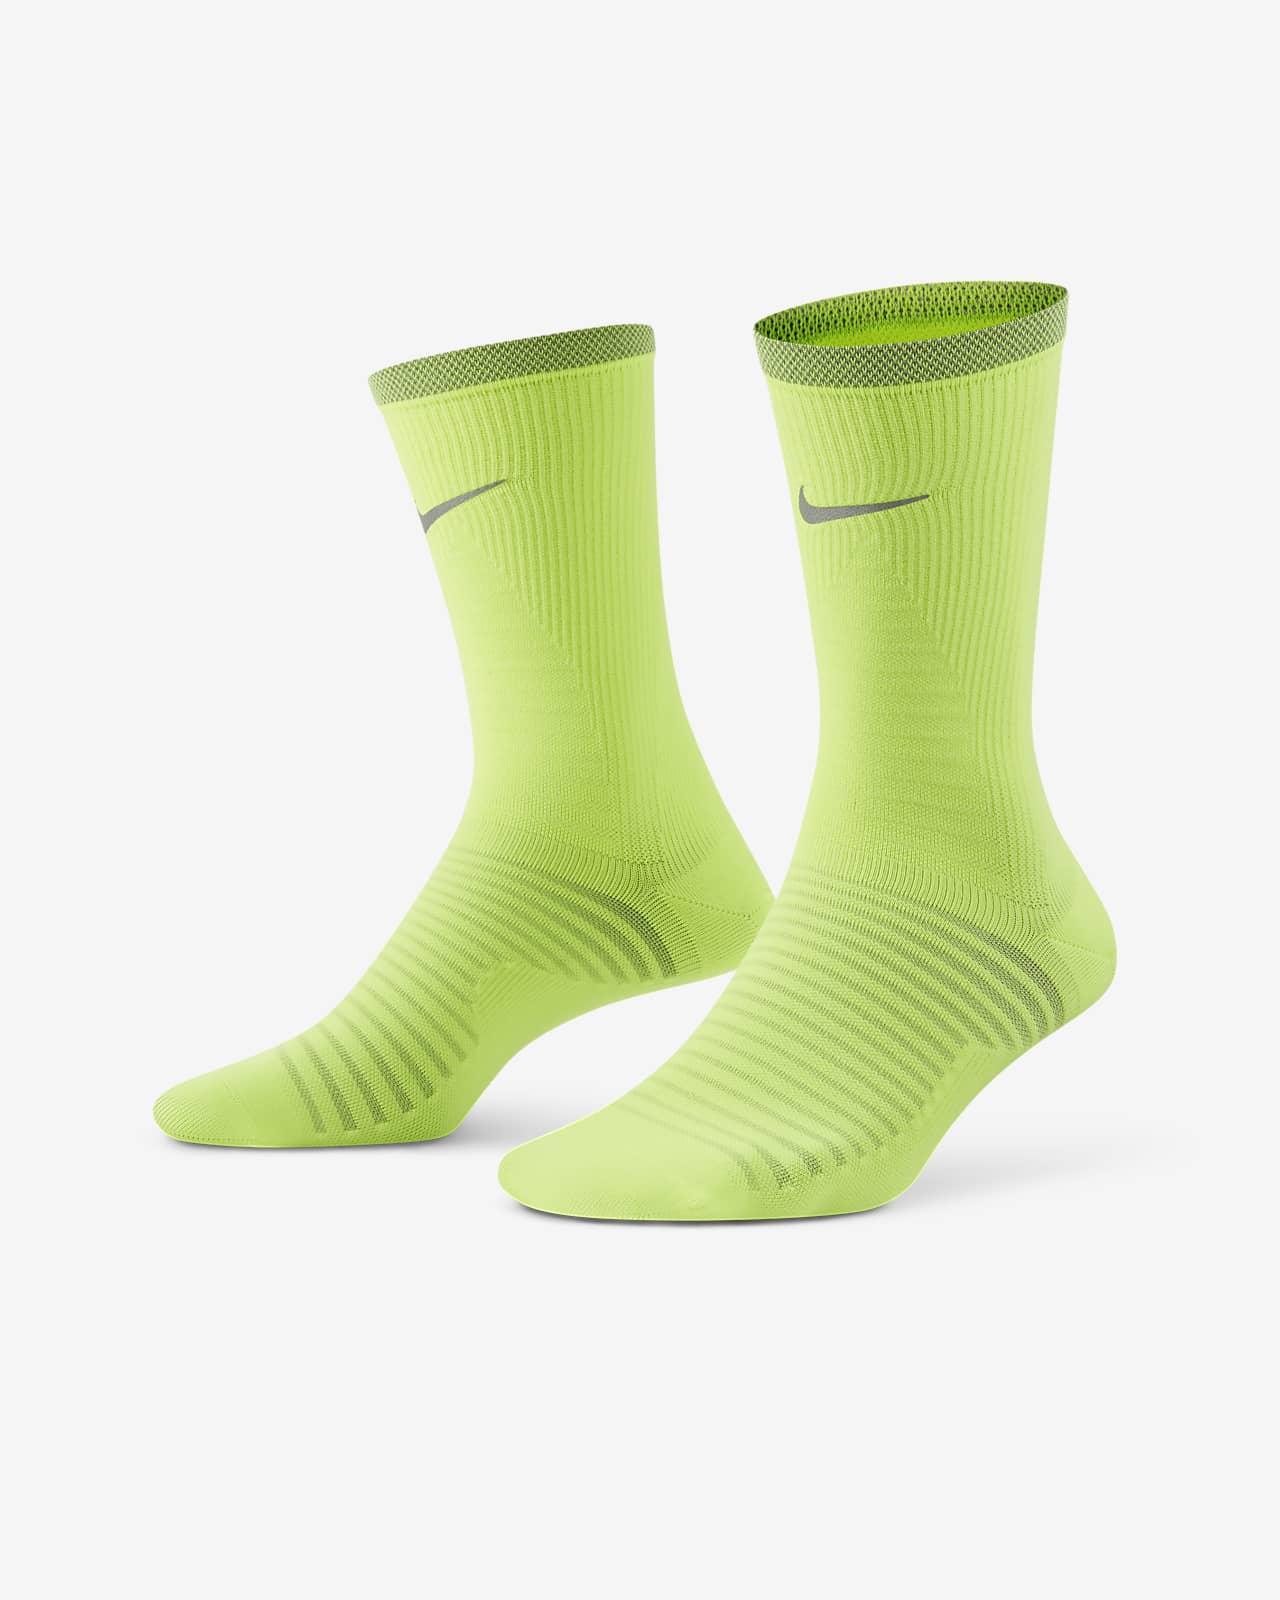 Nike Spark Lightweight Hardloopsokken